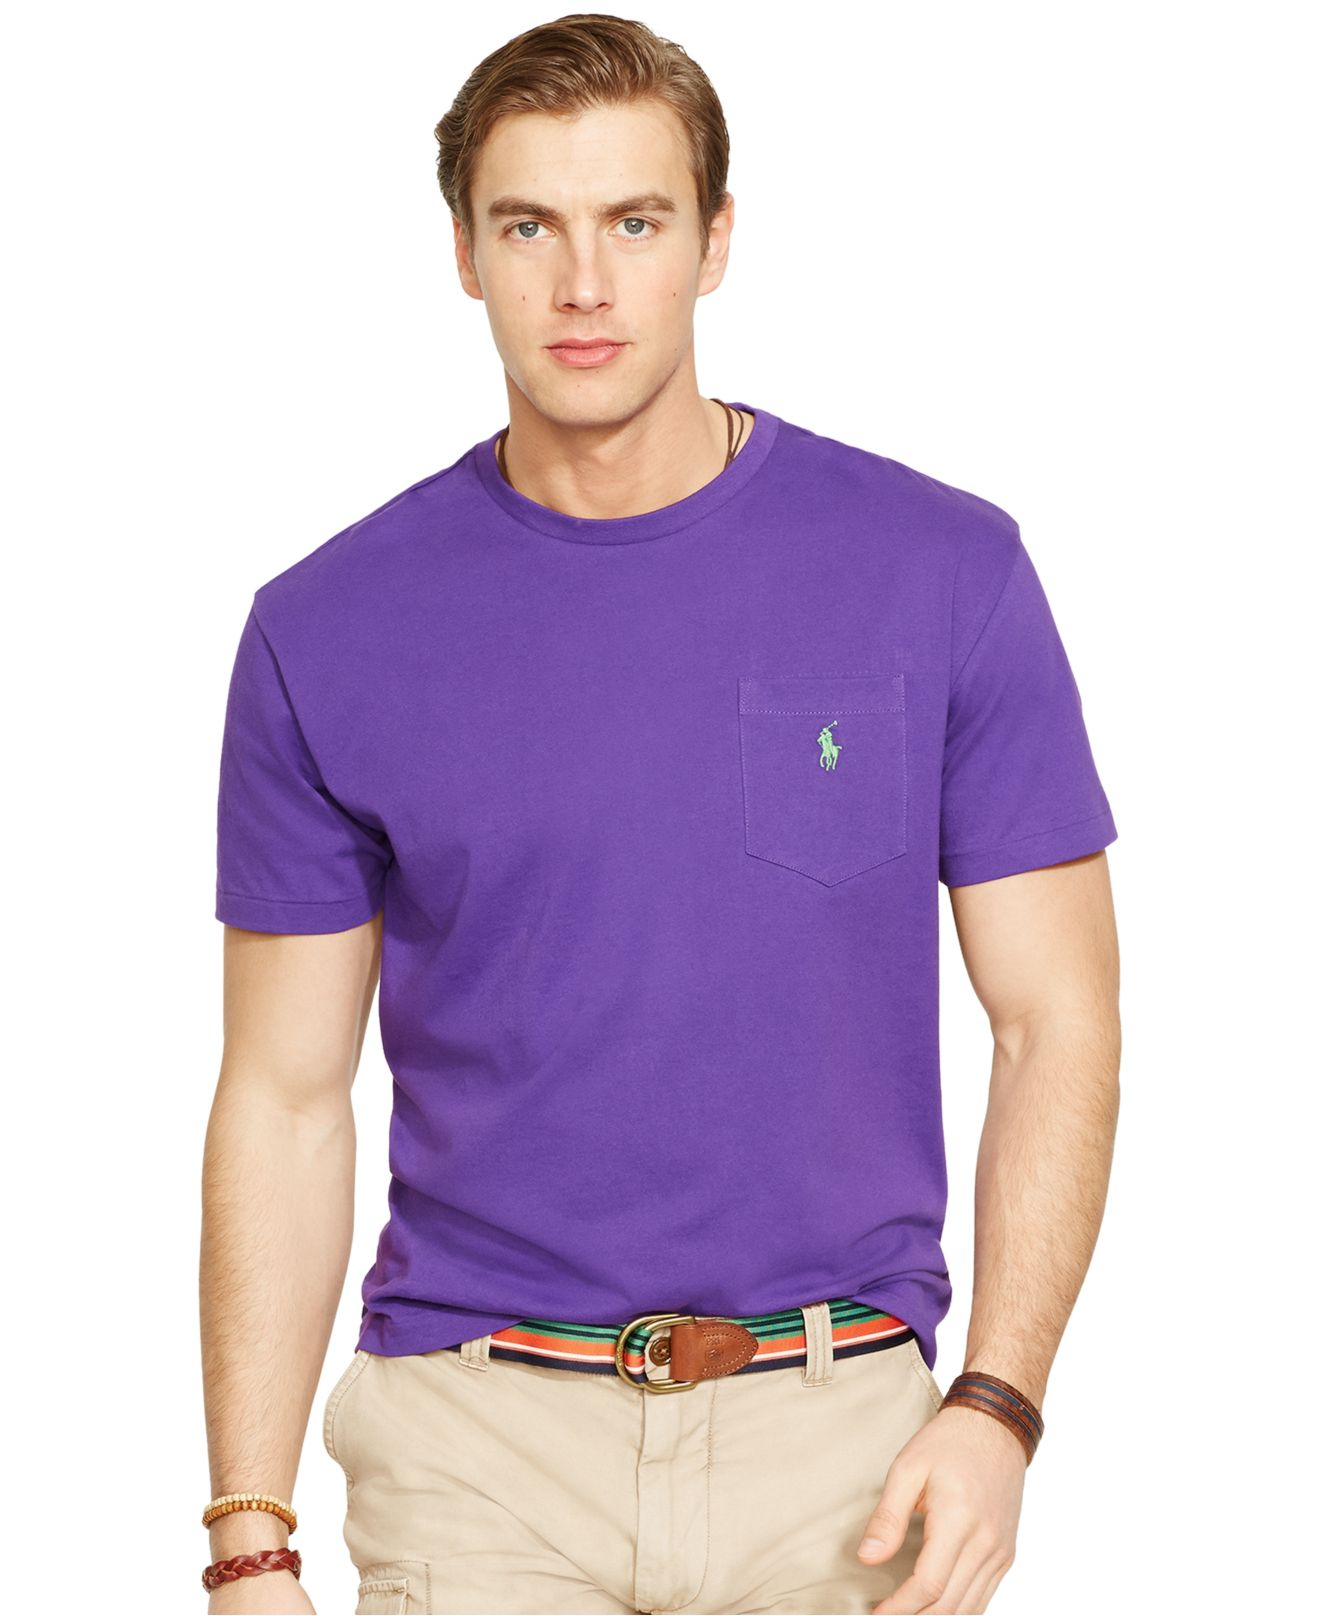 Neck Purple Lauren Shirt Crew Ralph Pocket T For Men Polo OPN8k0Xnw